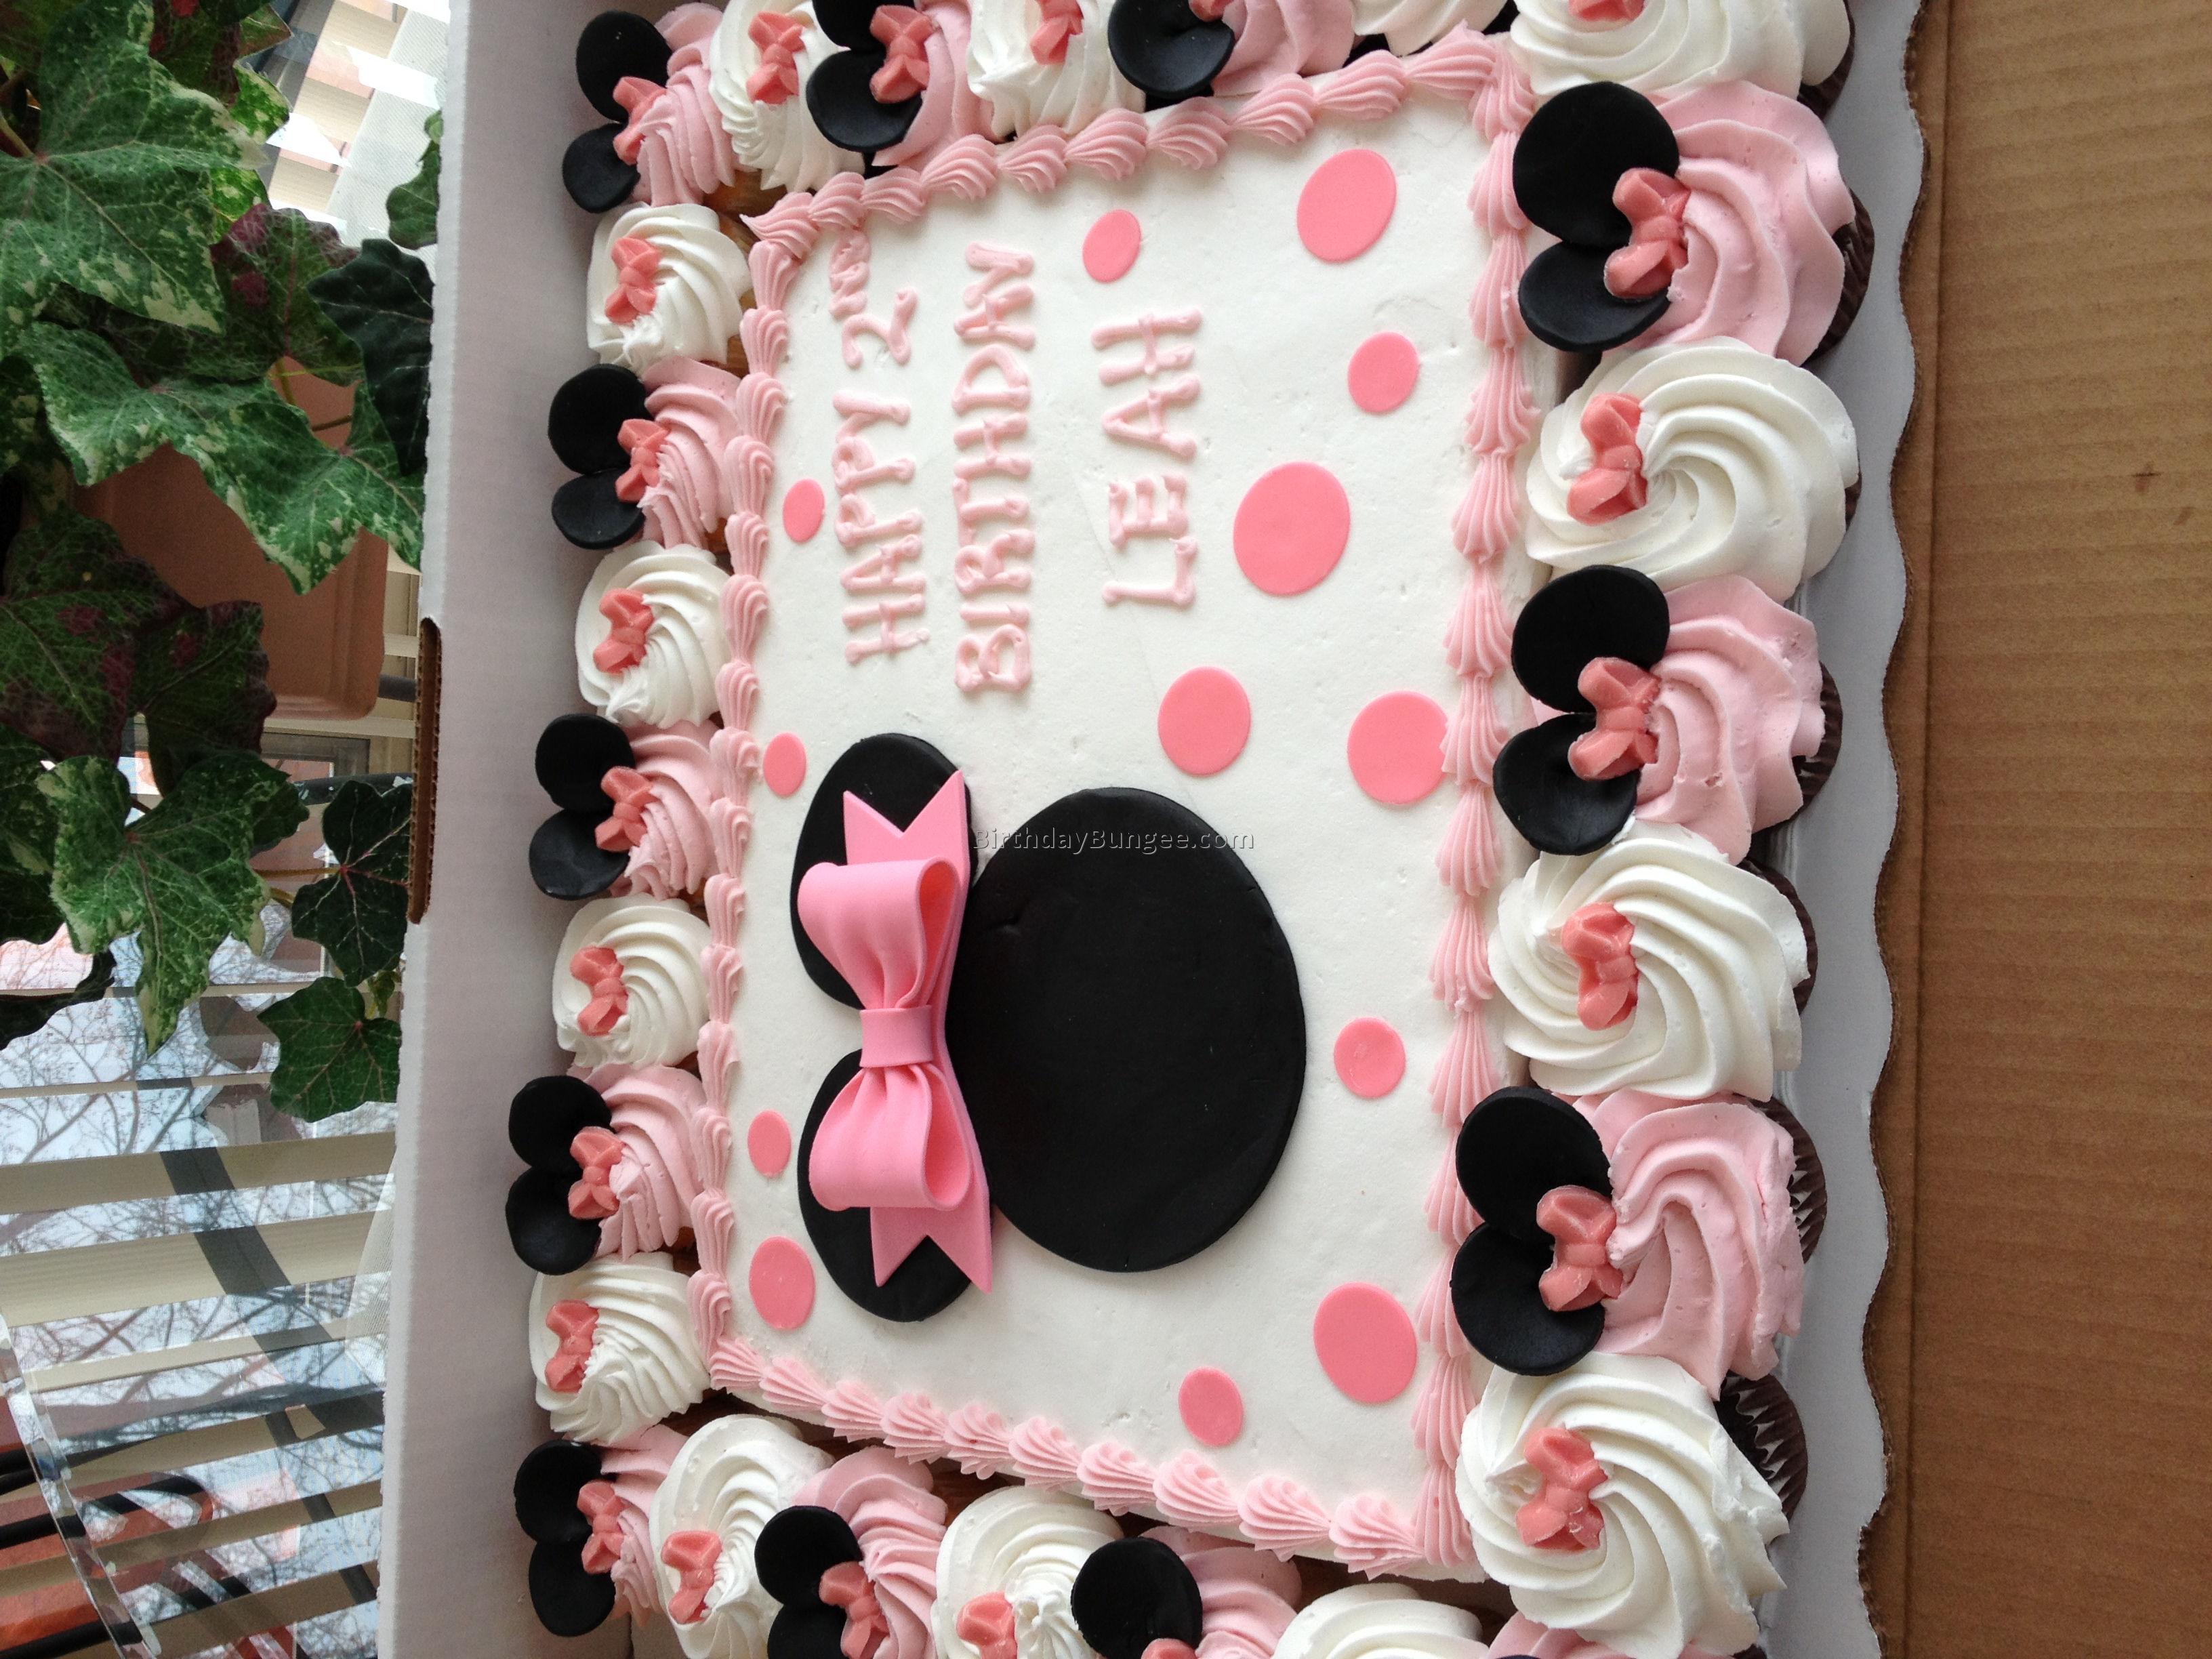 Brilliant 12 Sams Club Bakery Cakes Minnie Mouse Photo Sams Club Funny Birthday Cards Online Fluifree Goldxyz